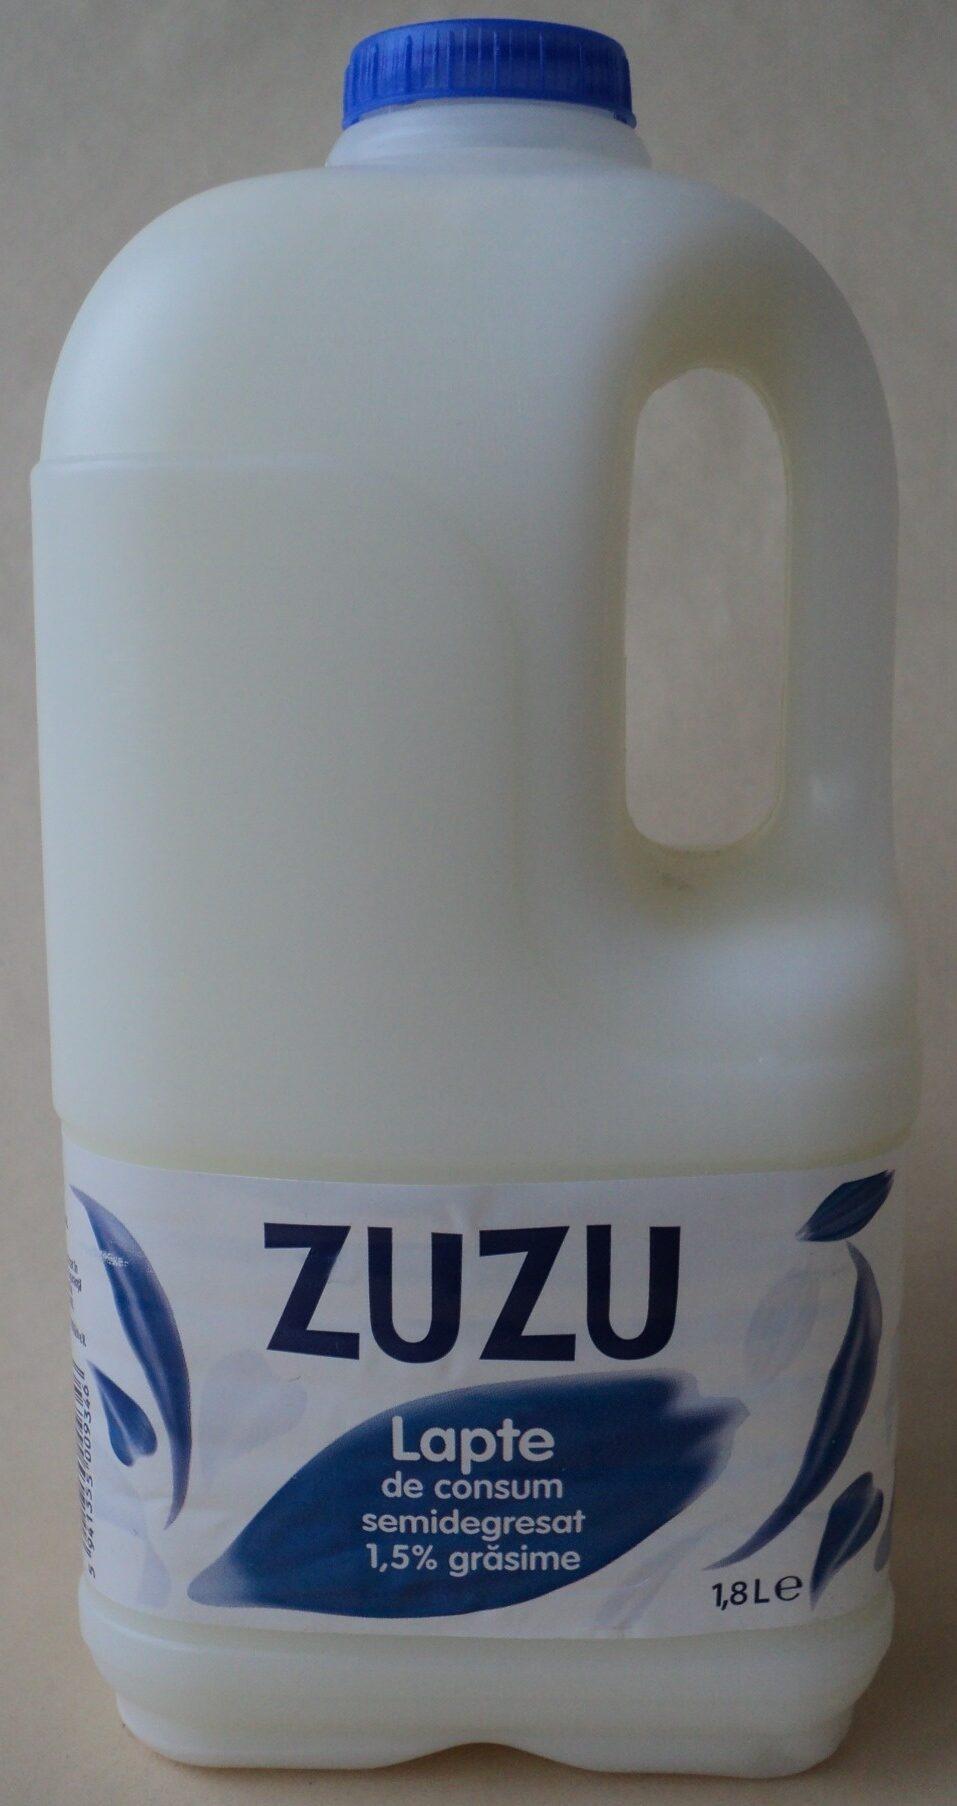 Zuzu Lapte de consum 1,5% - Producto - ro